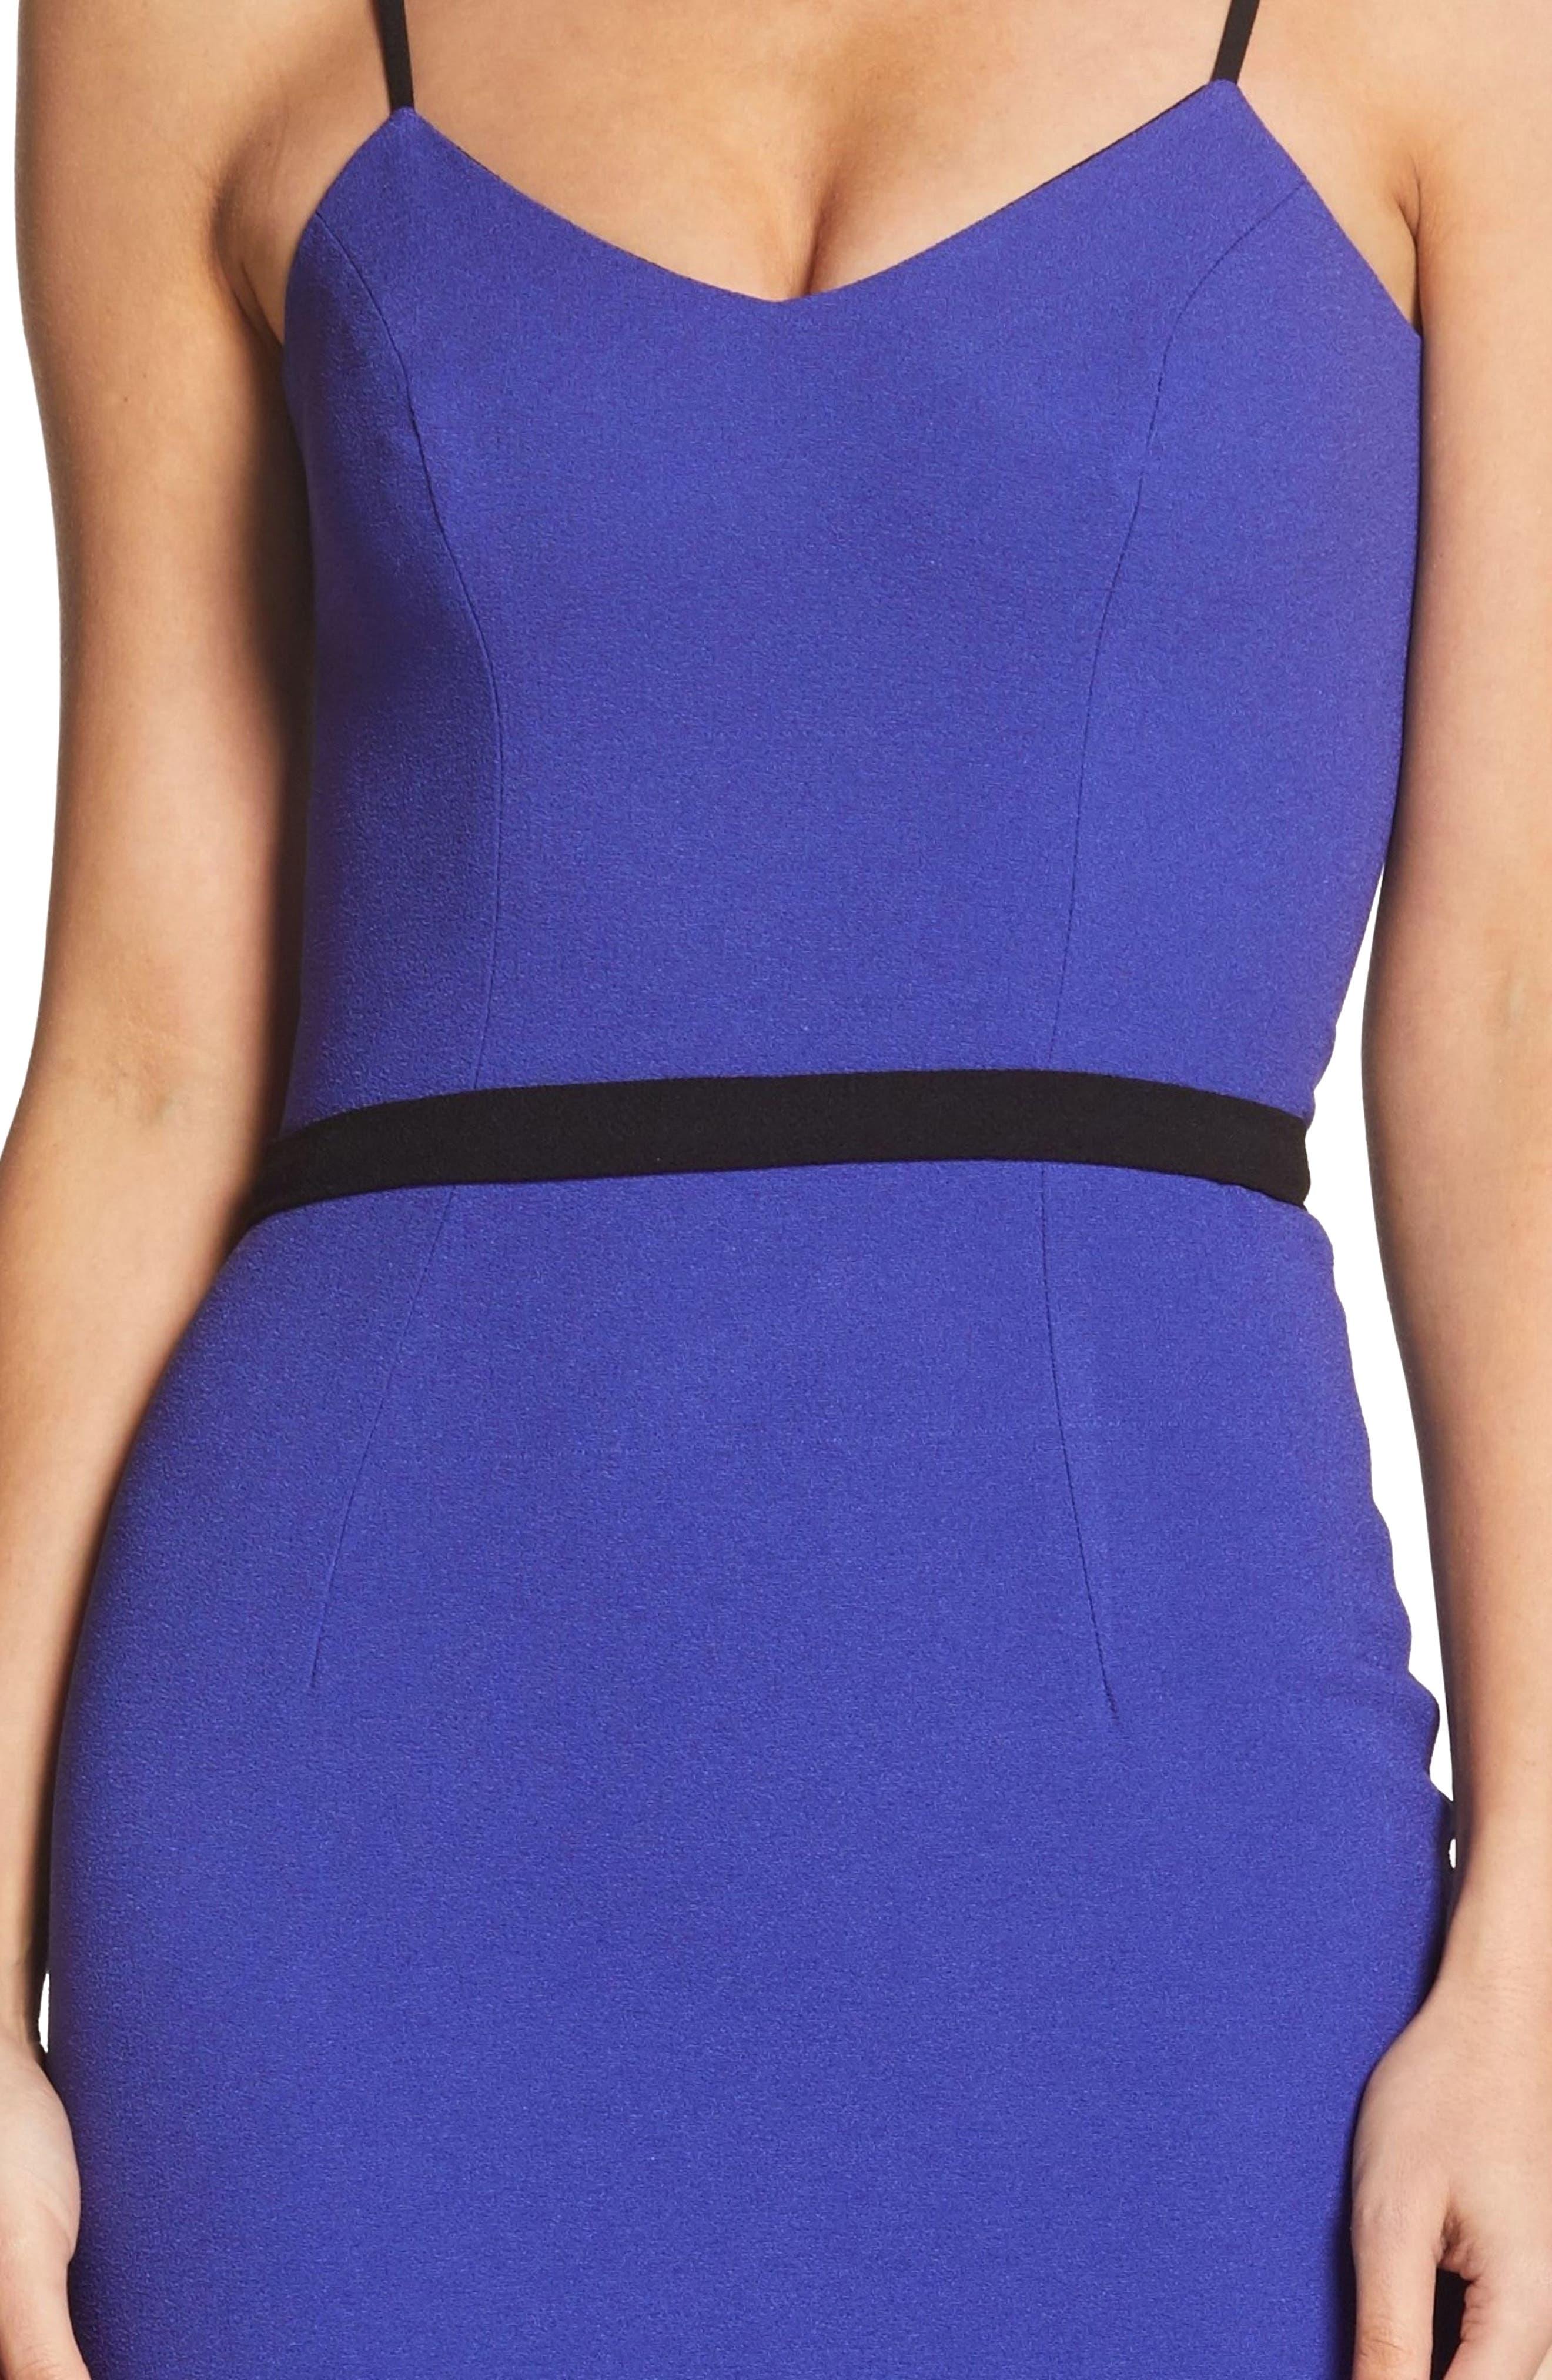 Emma Spaghetti Strap Body-Con Dress,                             Alternate thumbnail 4, color,                             BLUE/ VIOLET